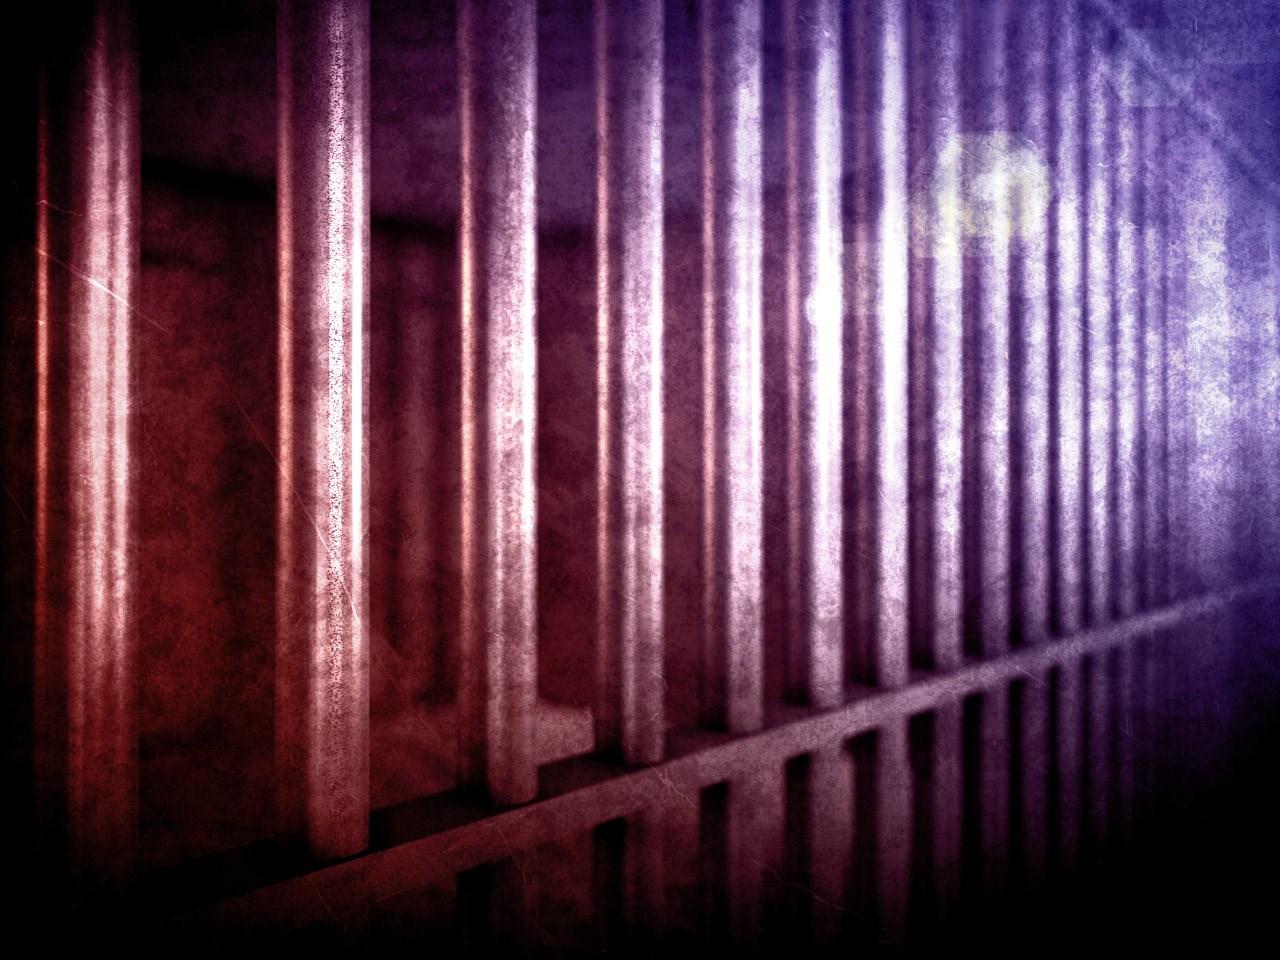 Police Bars Jail Prison 1_1536237983027.jpg.jpg